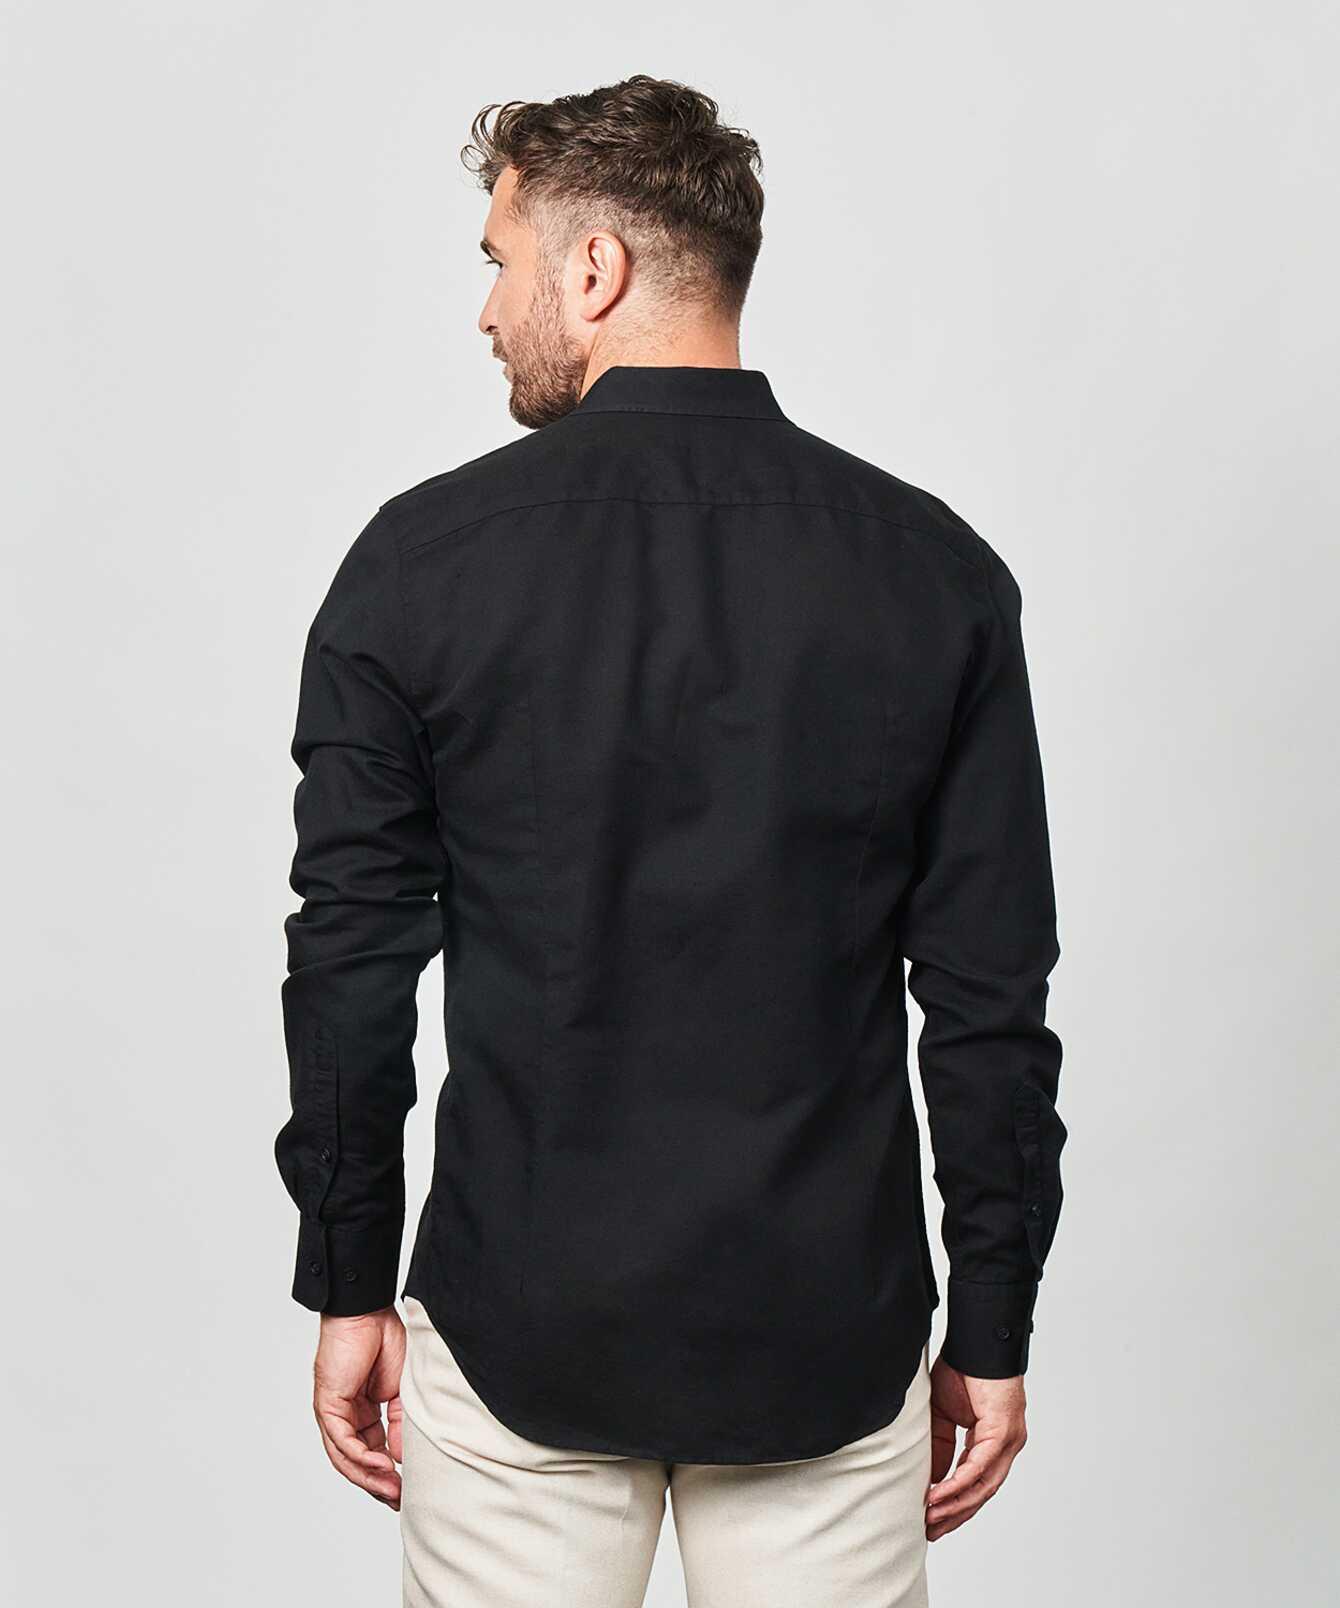 Shirt Portofino Linen Black  The Shirt Factory